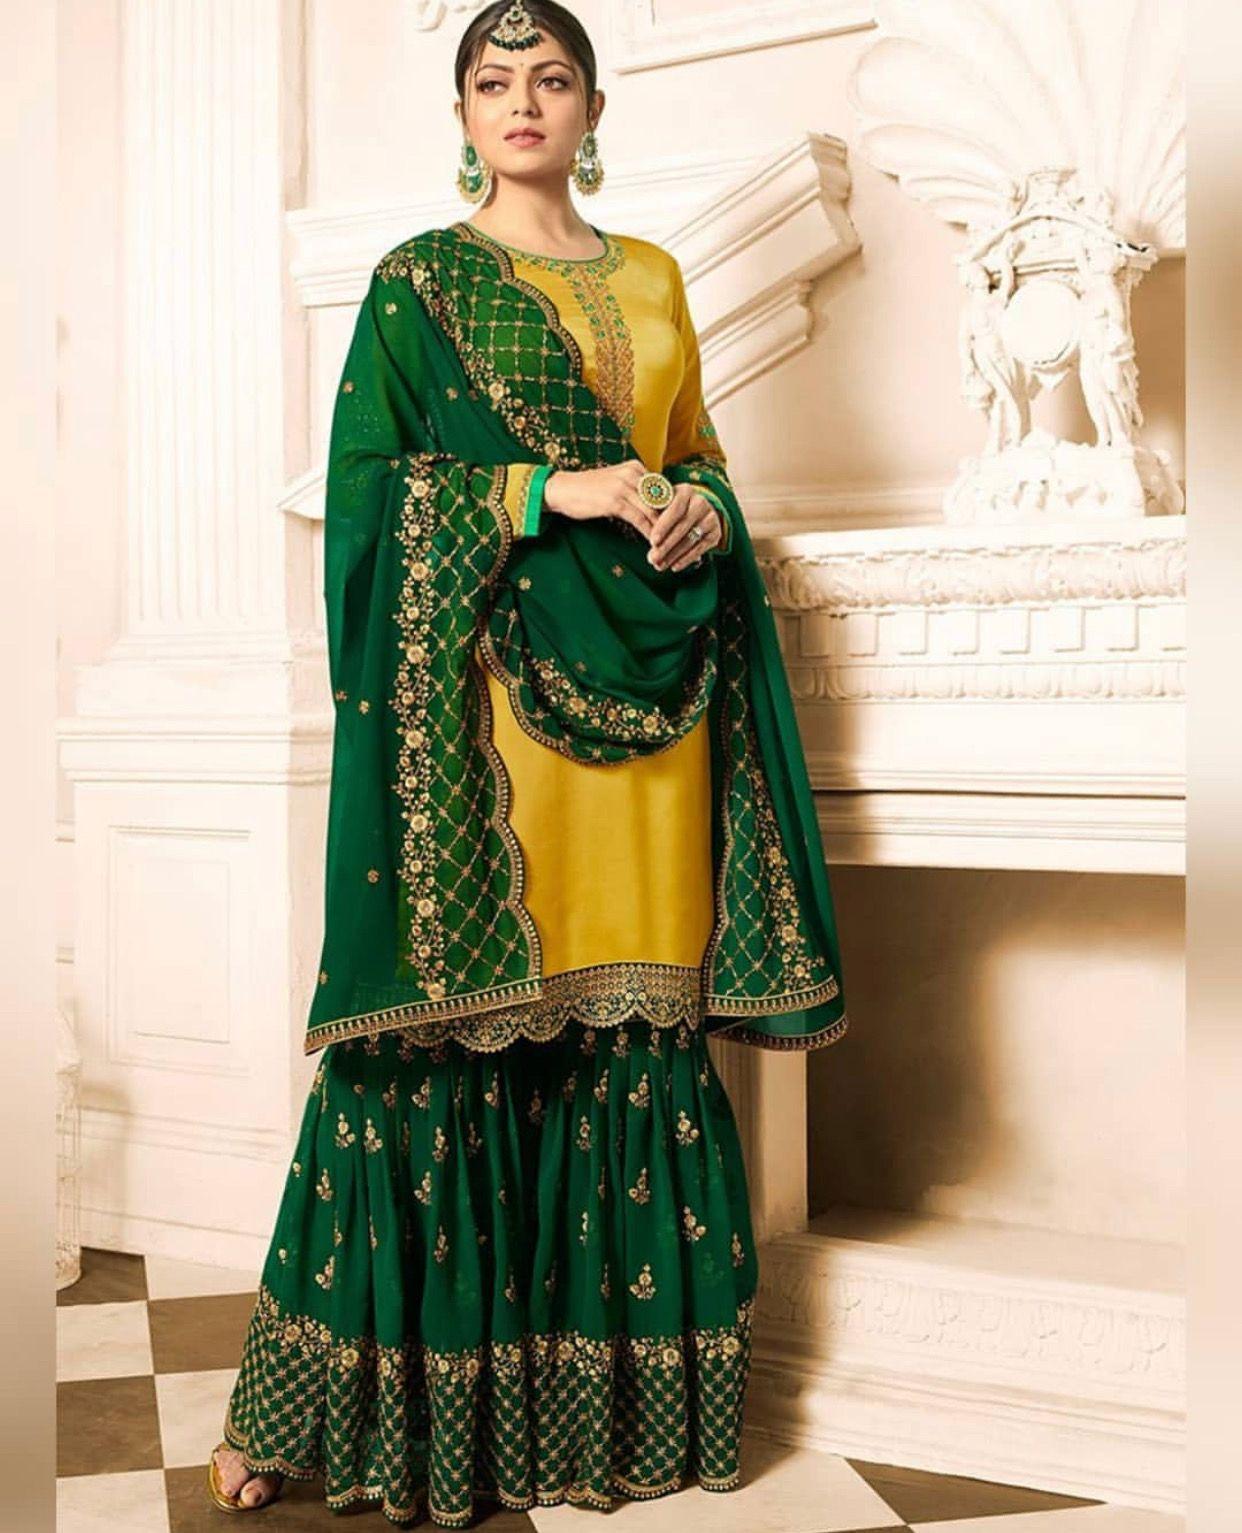 3905acdcf1 Pinterest: @pawank90 | Sharara and Palazzo | Sharara suit, Indian ...